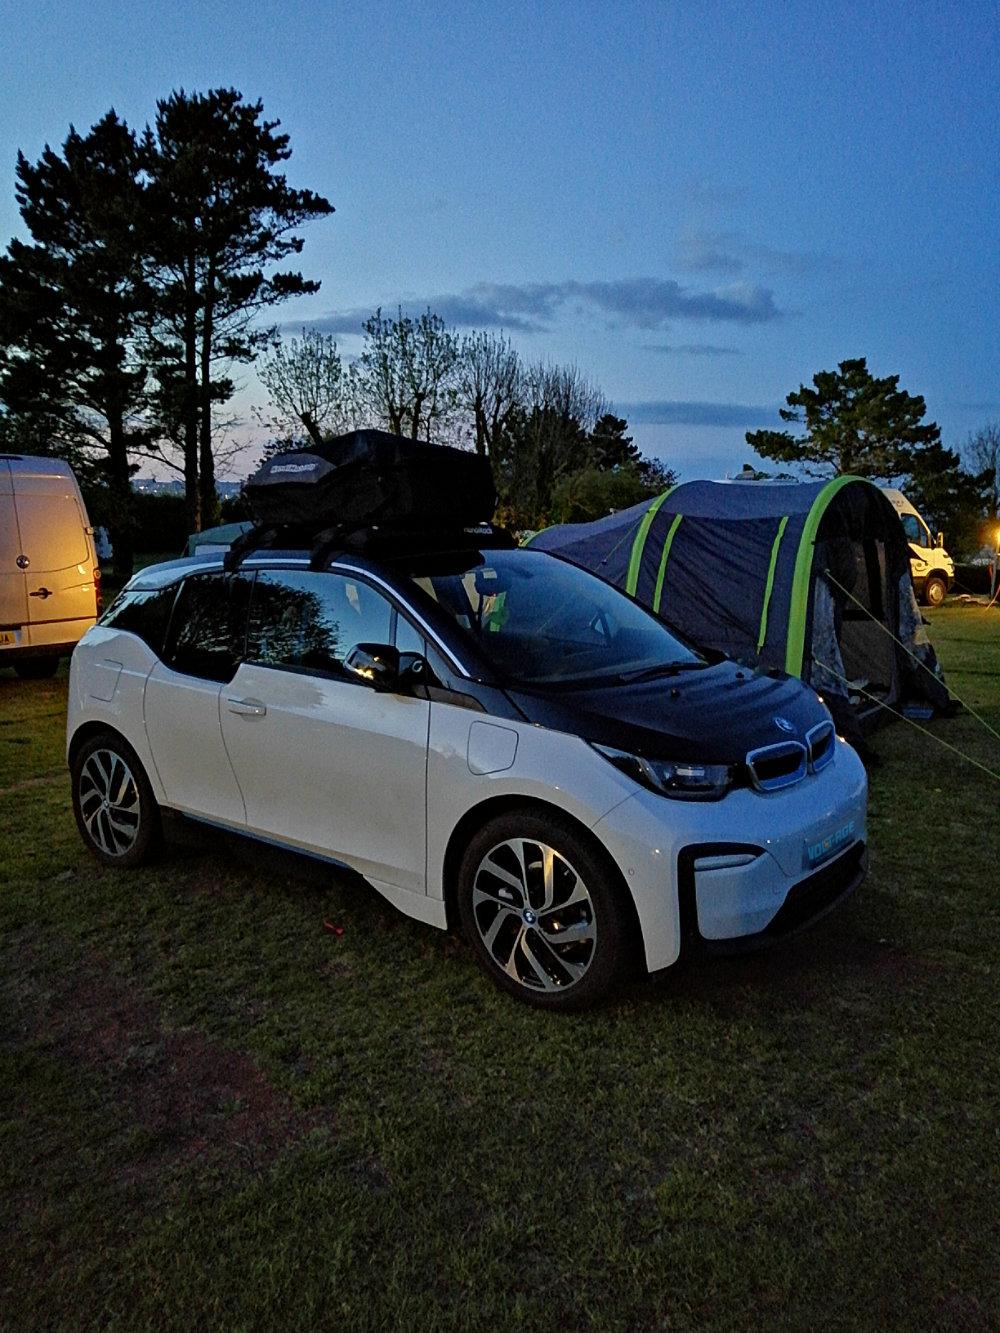 this week s volt a bmw i3 ev camping trip vw i d tesla model 3 order news